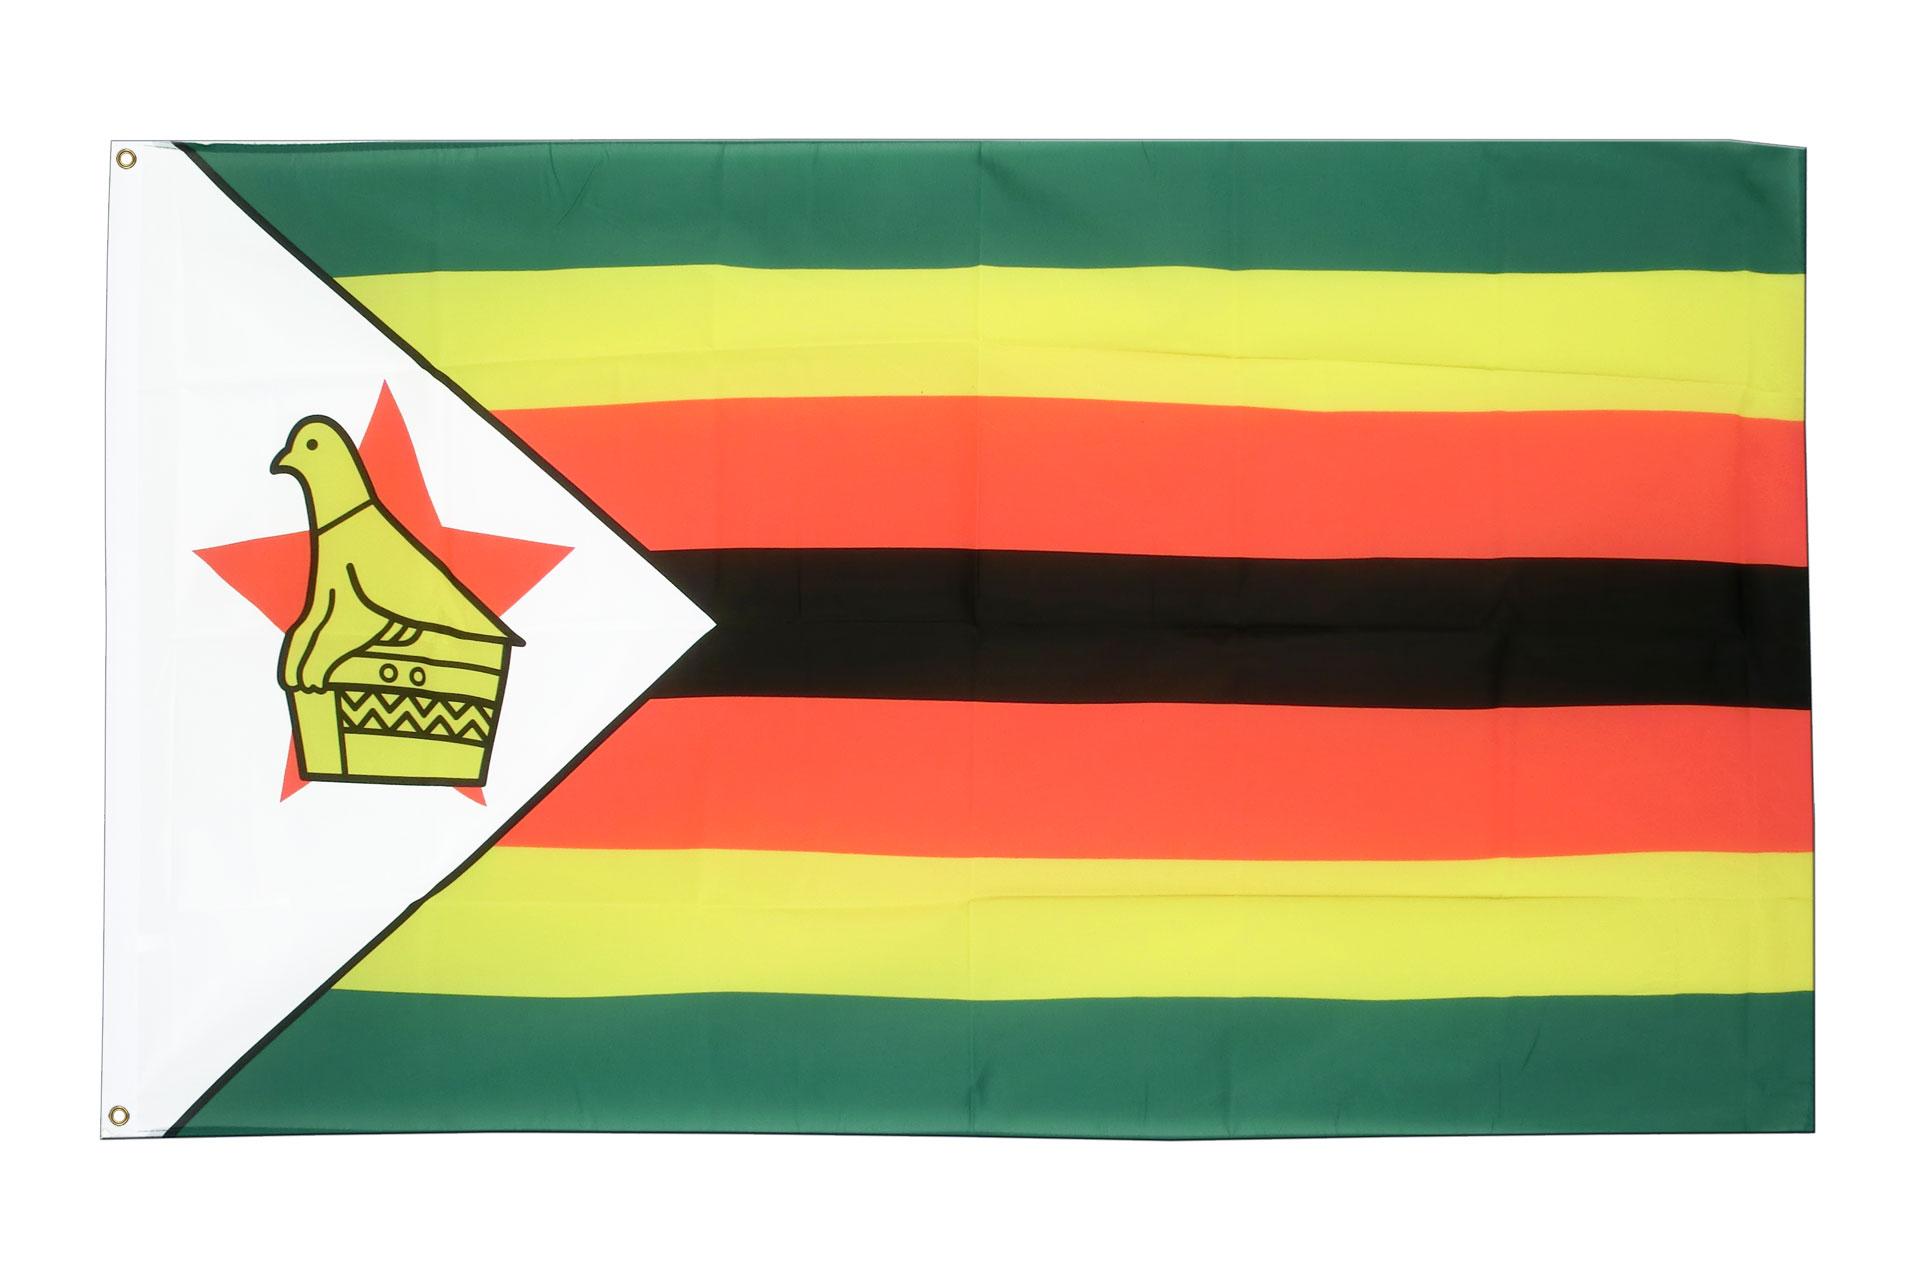 Buy Zimbabwe Flag - 3x5 ft (90x150 cm) - Royal-Flags: https://www.royal-flags.co.uk/zimbabwe-flag-2001.html